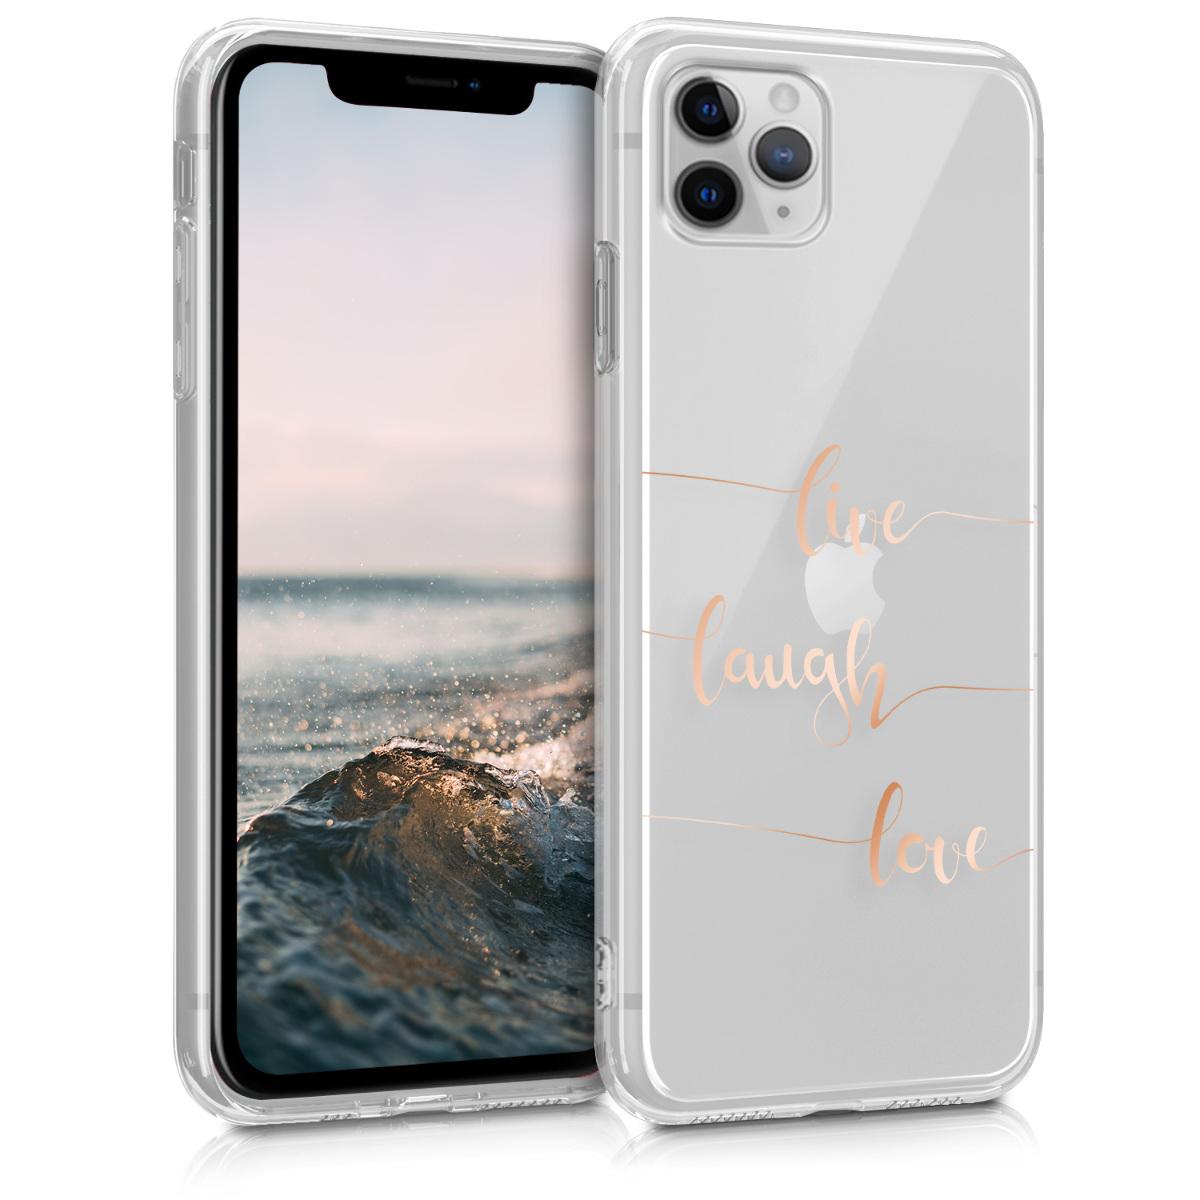 KW Θήκη Σιλικόνης Apple iPhone 11 Pro - Crystal Clear - Rose Gold / Transparent (49784.02)